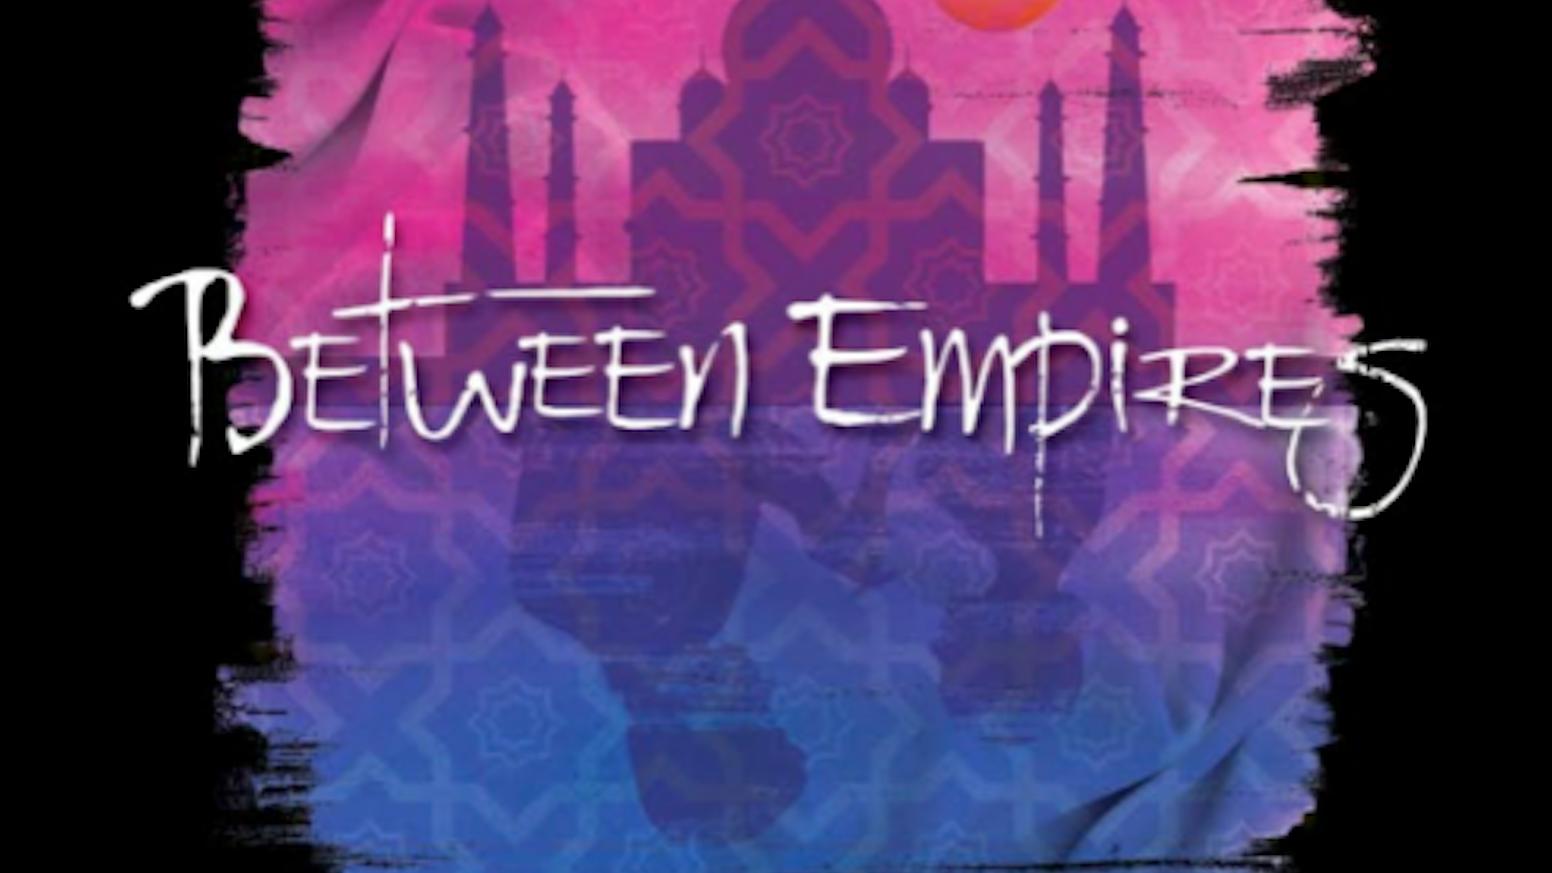 Between Empires-A new & original musical by Orlando & Morgan